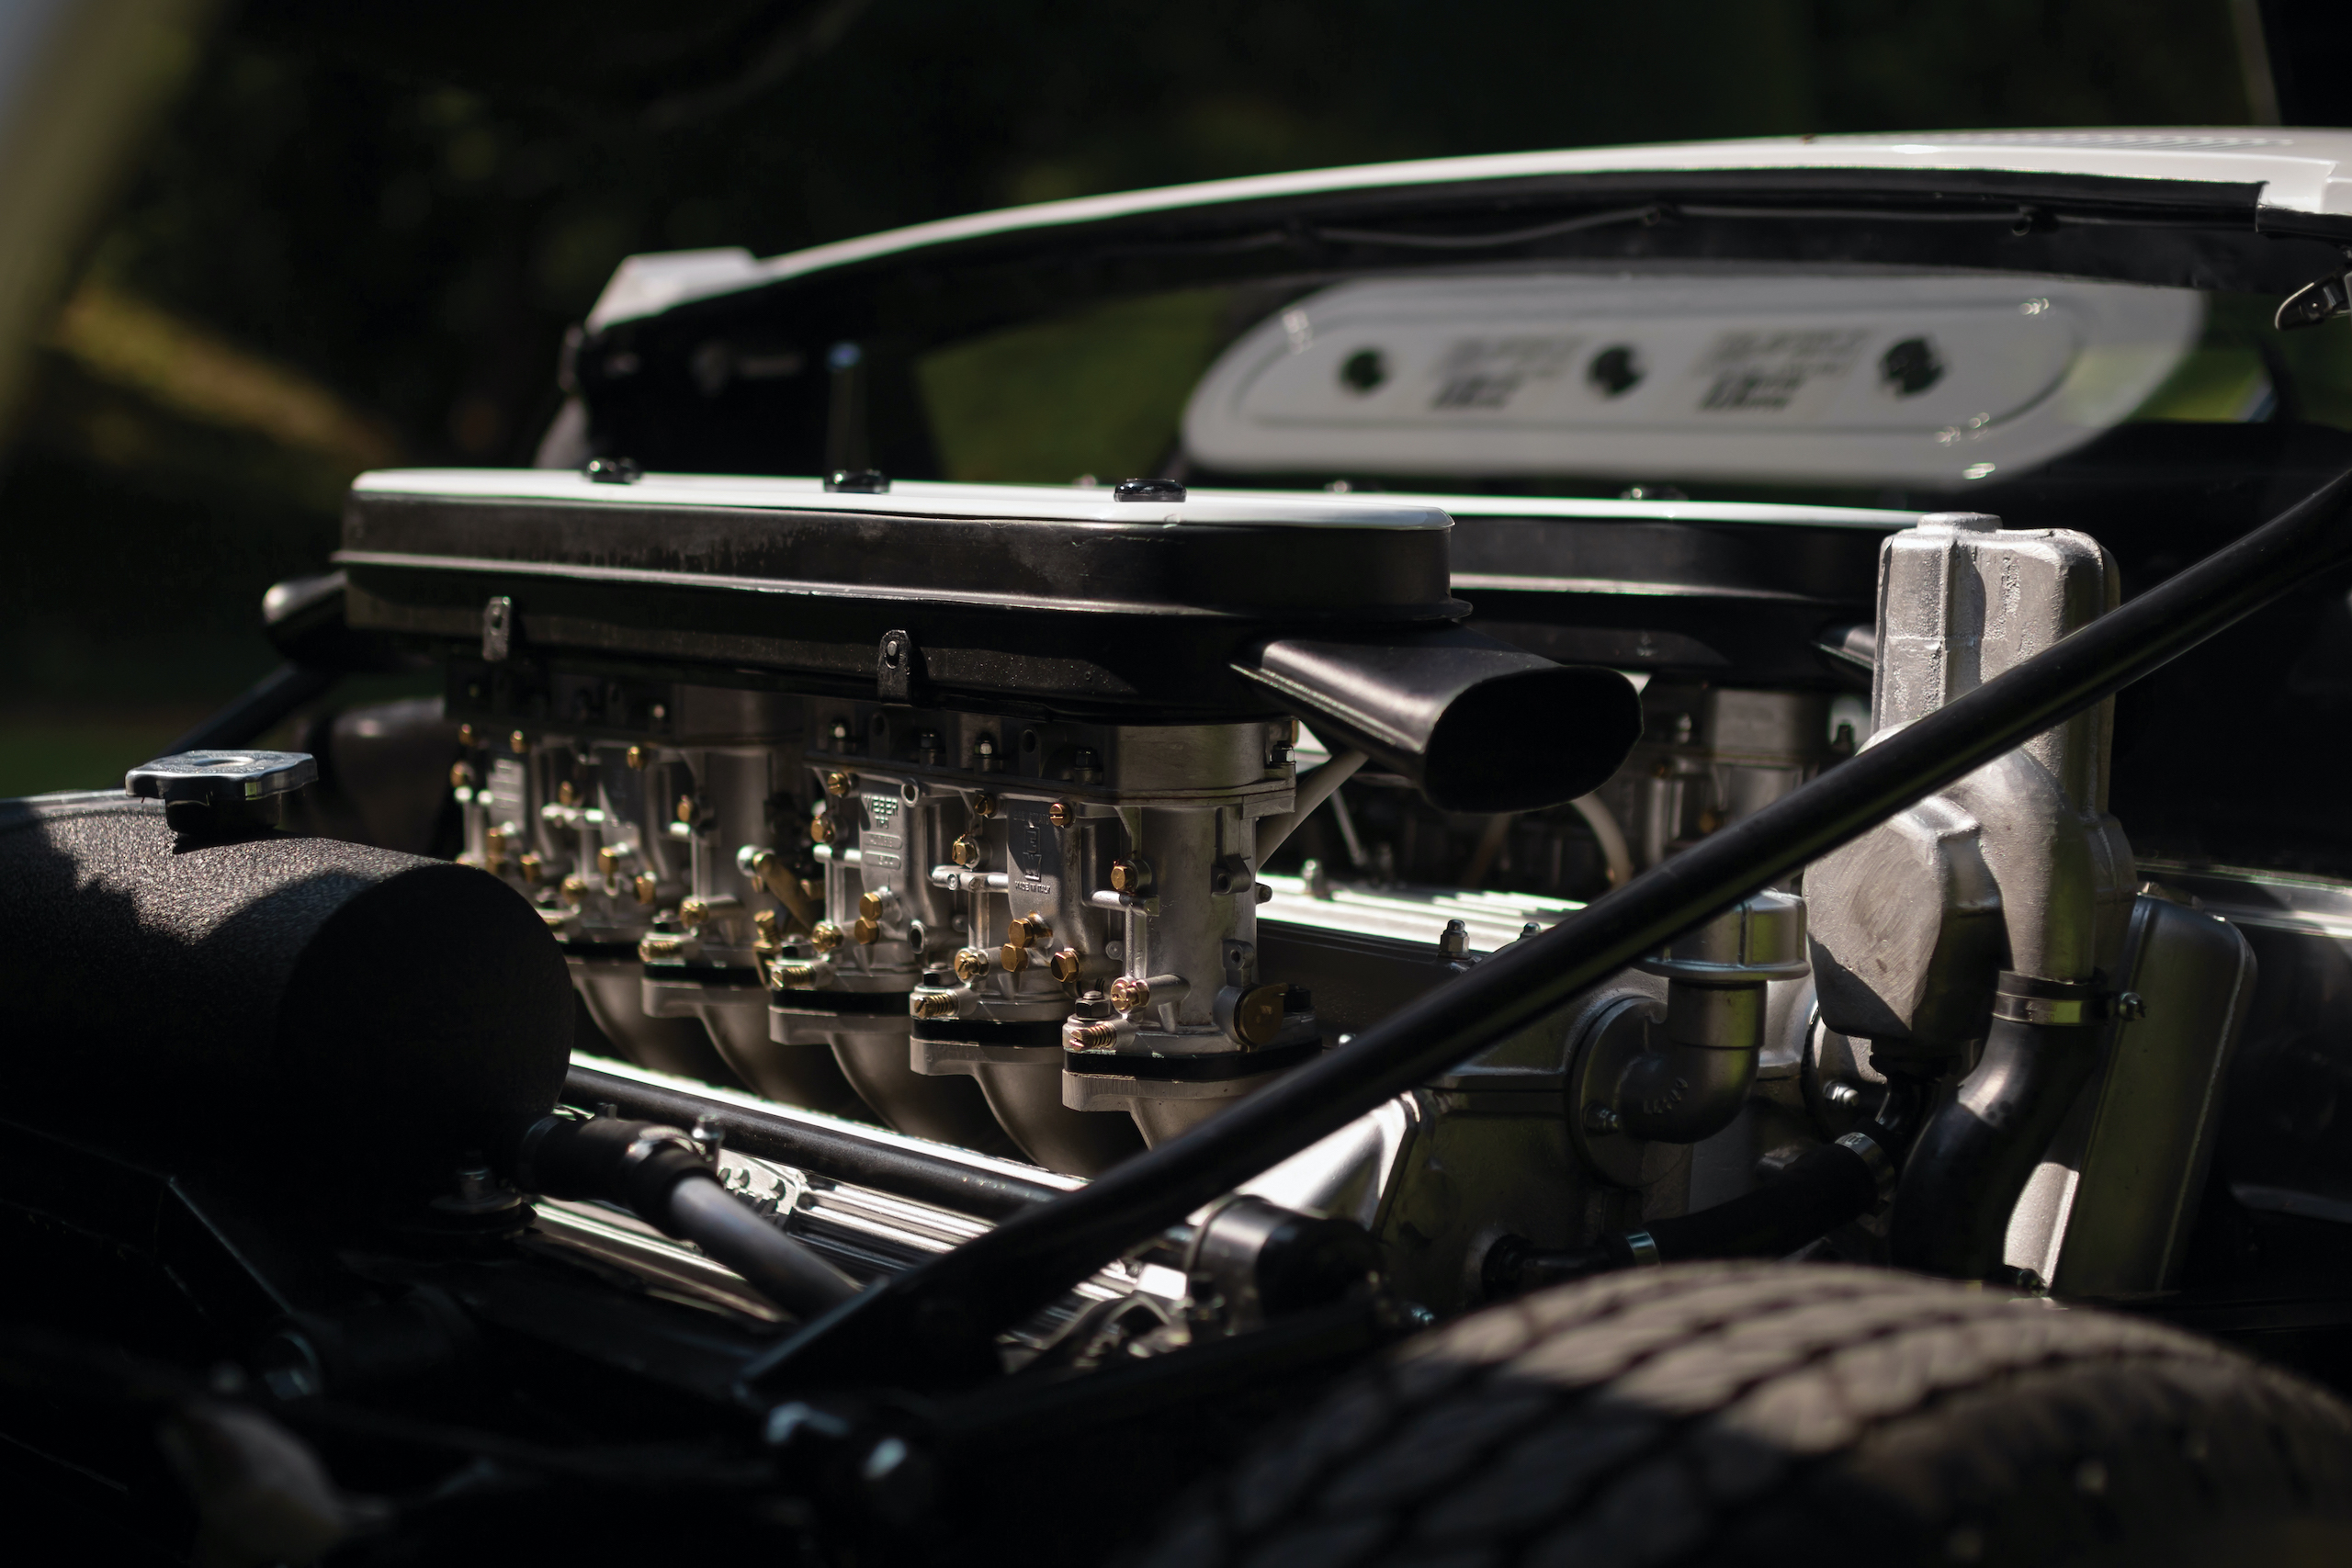 1971 Lamborghini Miura P400 S by Bertone engine